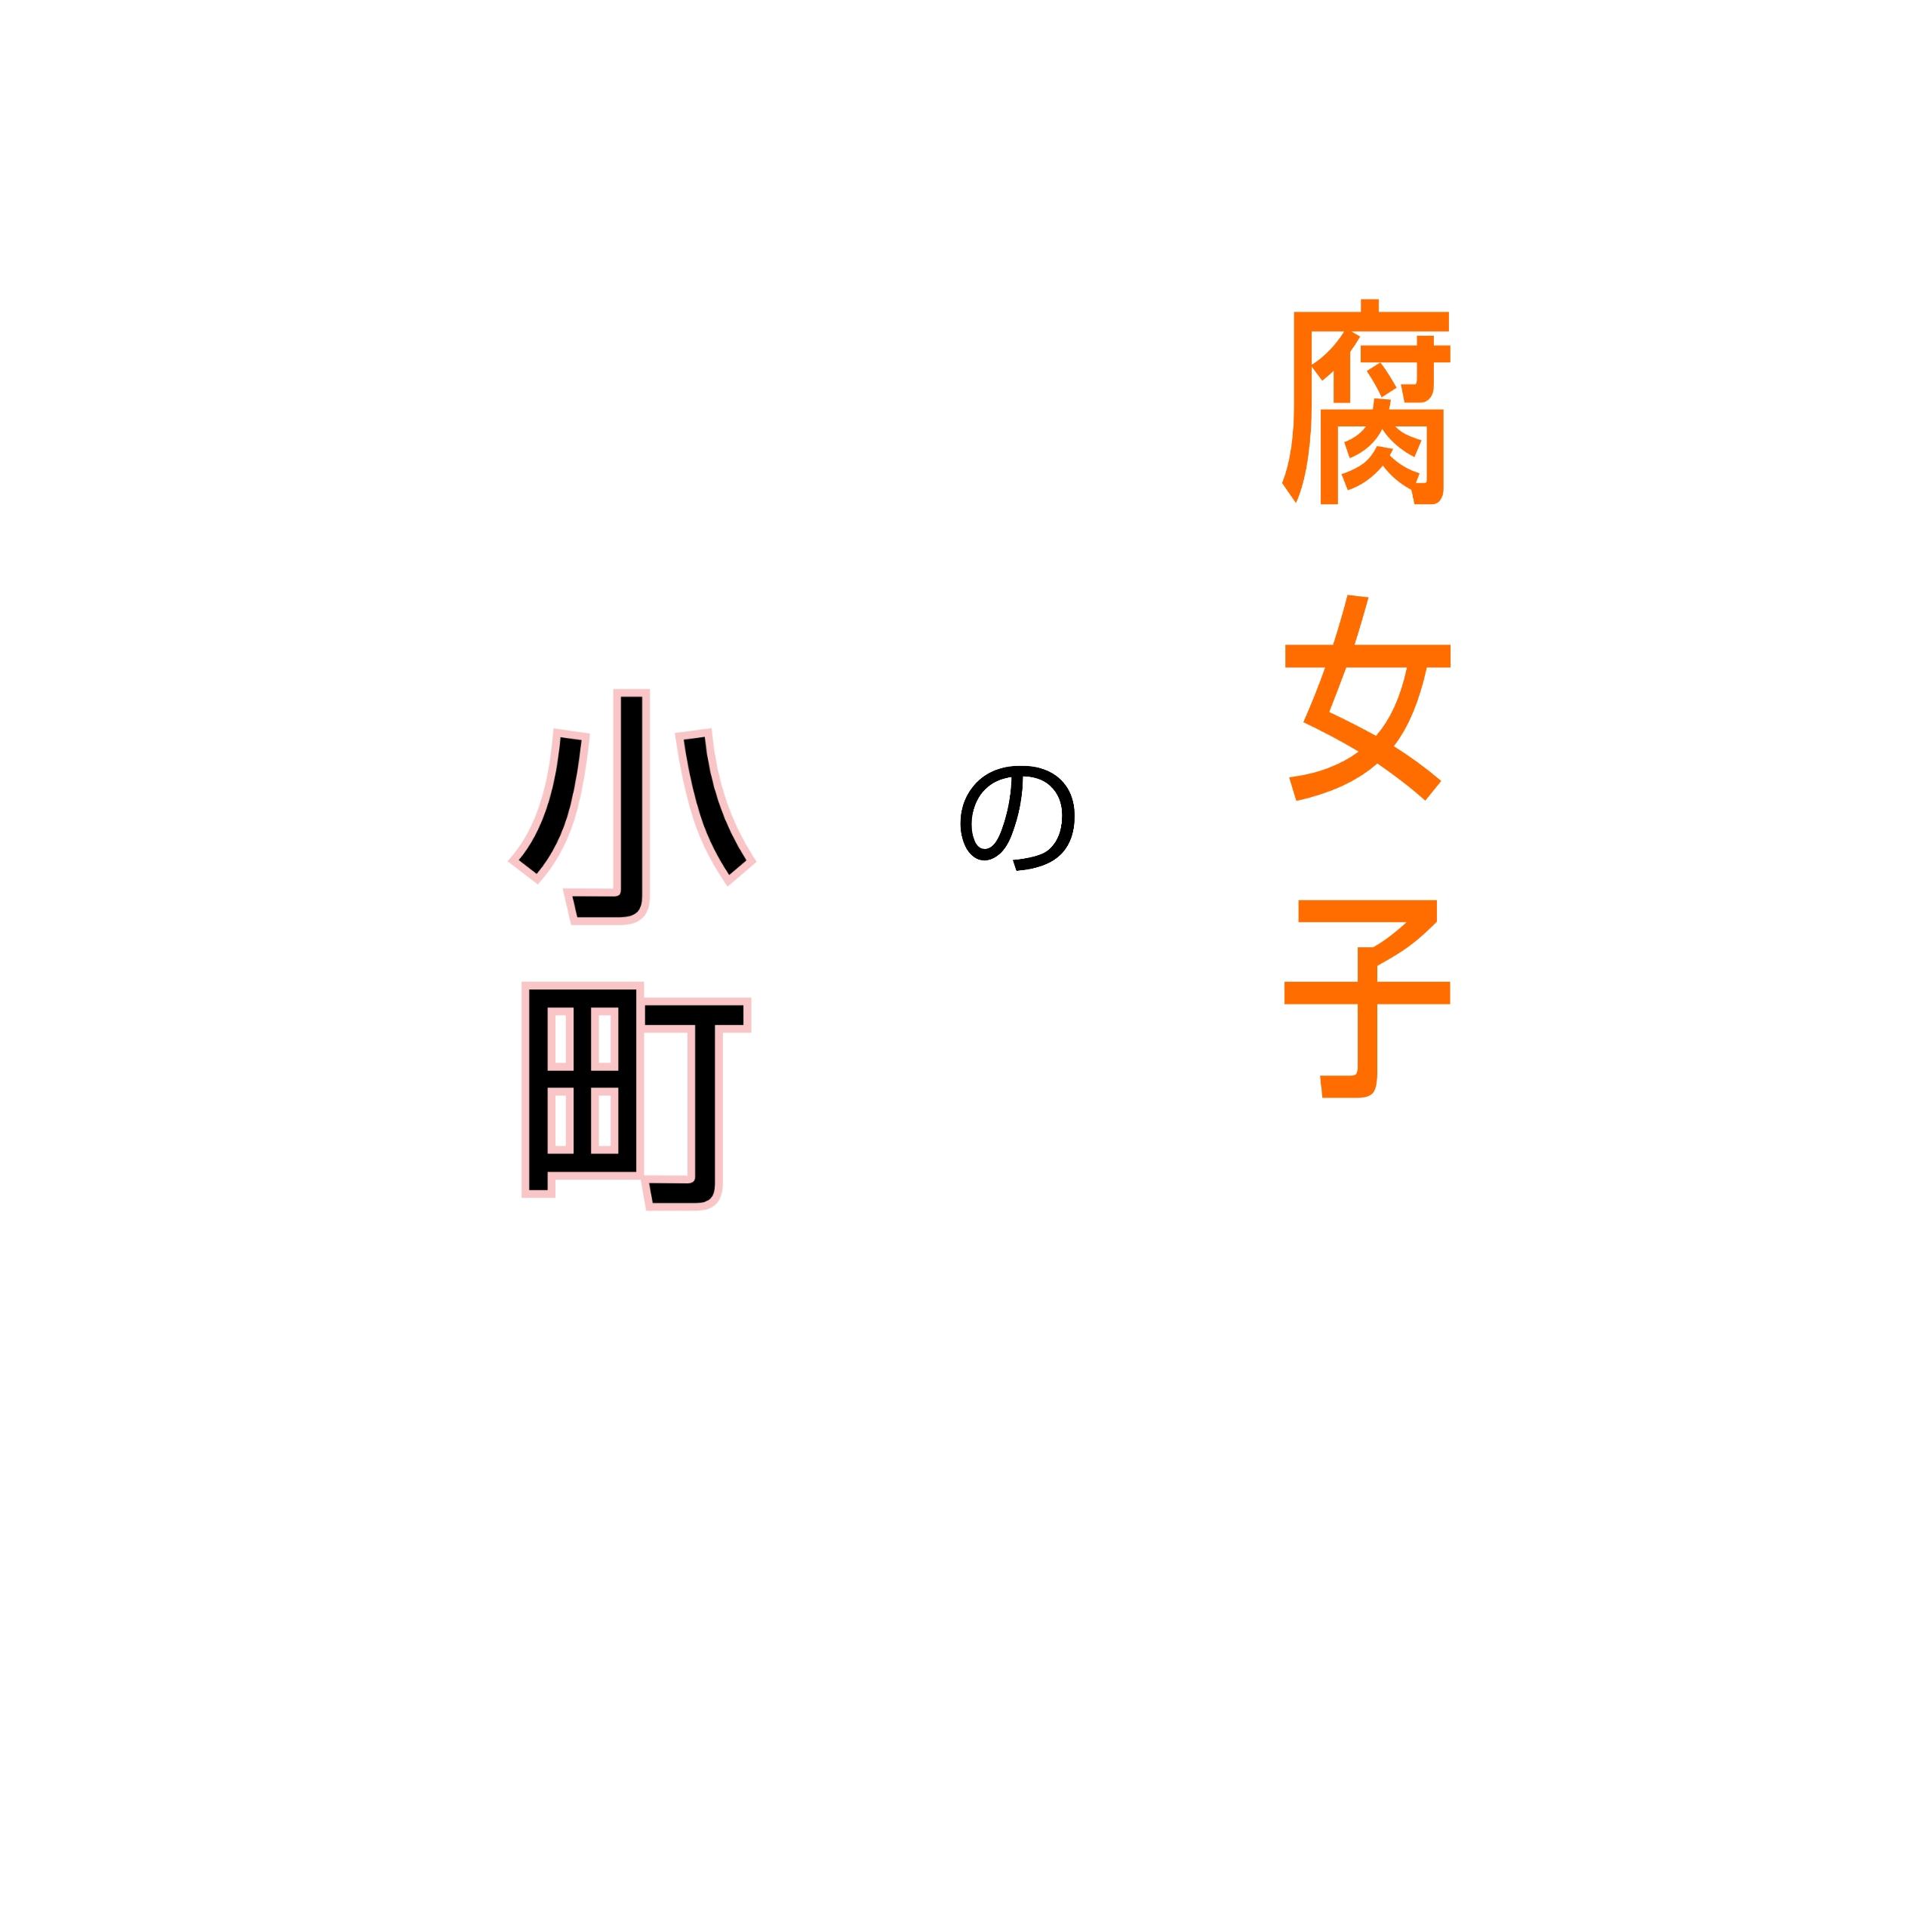 腐女子の小町「舞台刀剣乱舞新キャスト発表で大興奮」